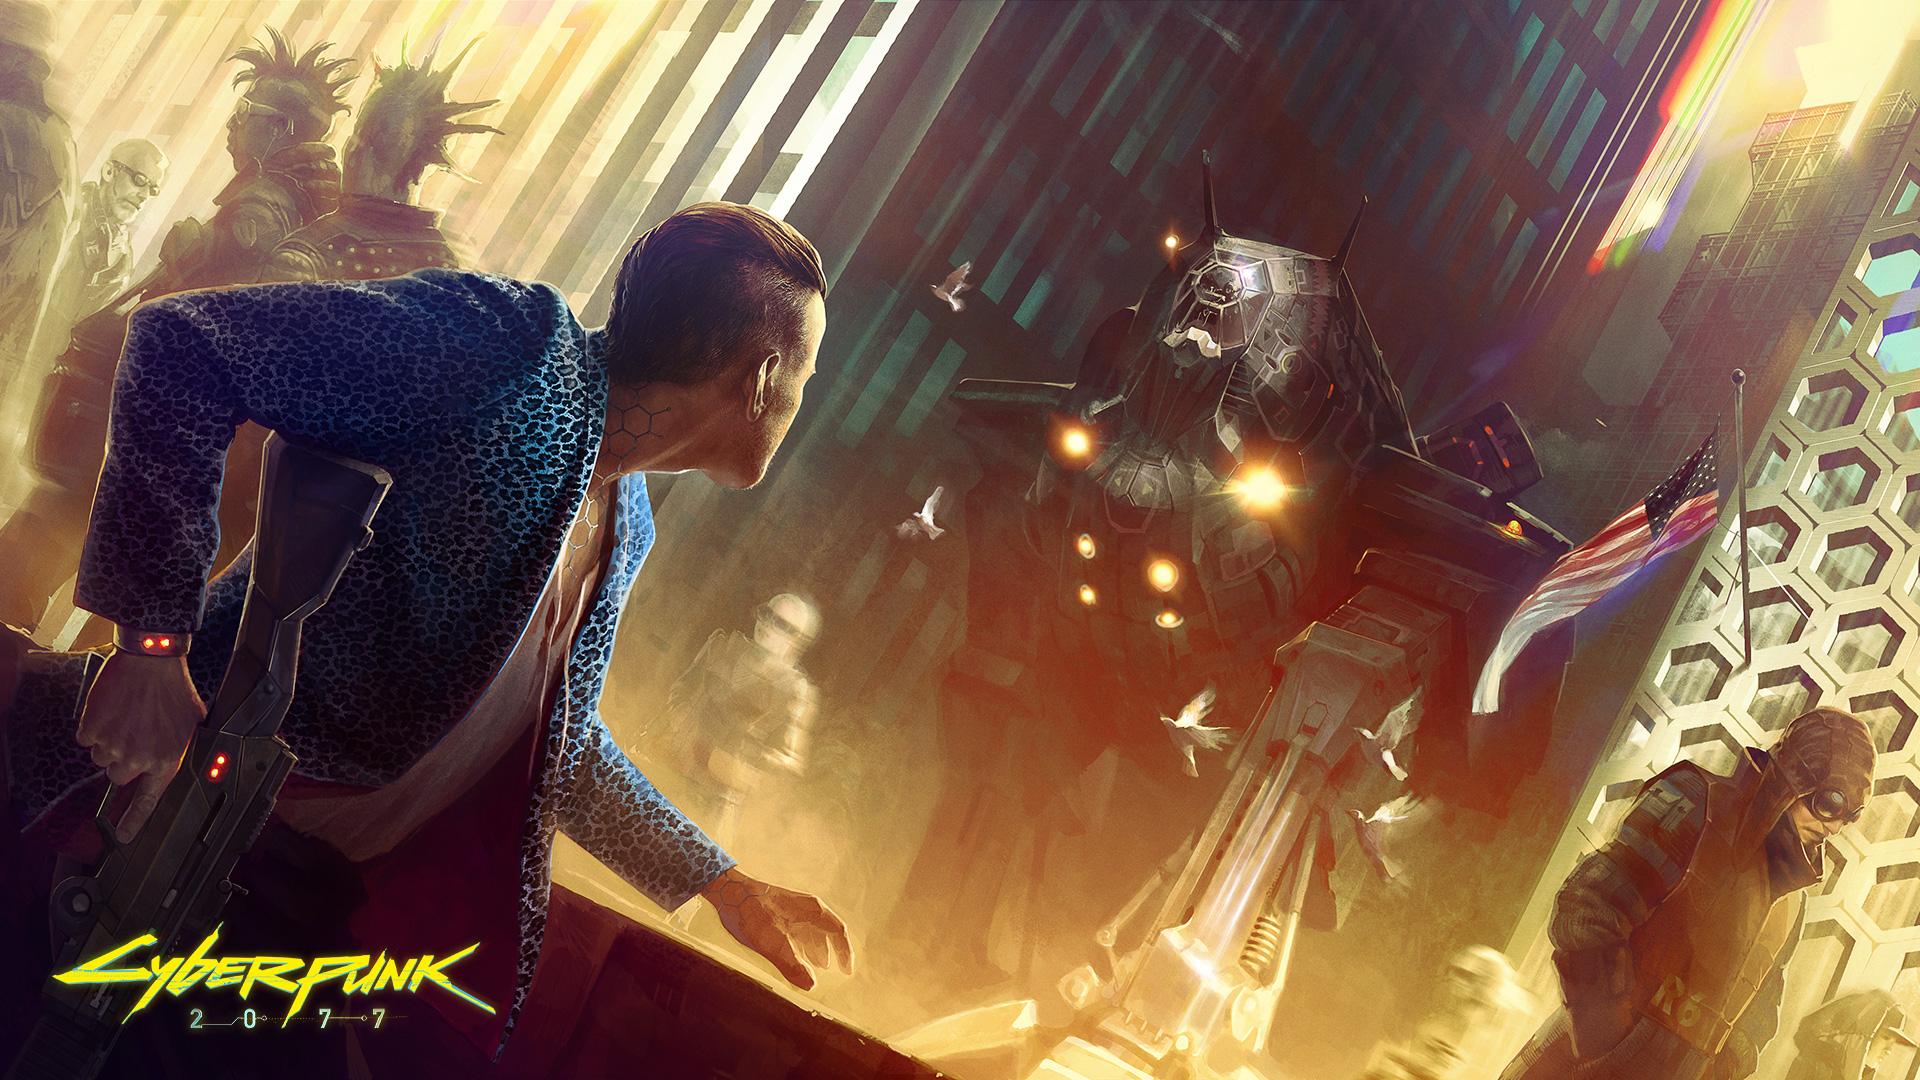 Multiplayerový Cyberpunk 2077 až v roce 2022 a jako AAA titul